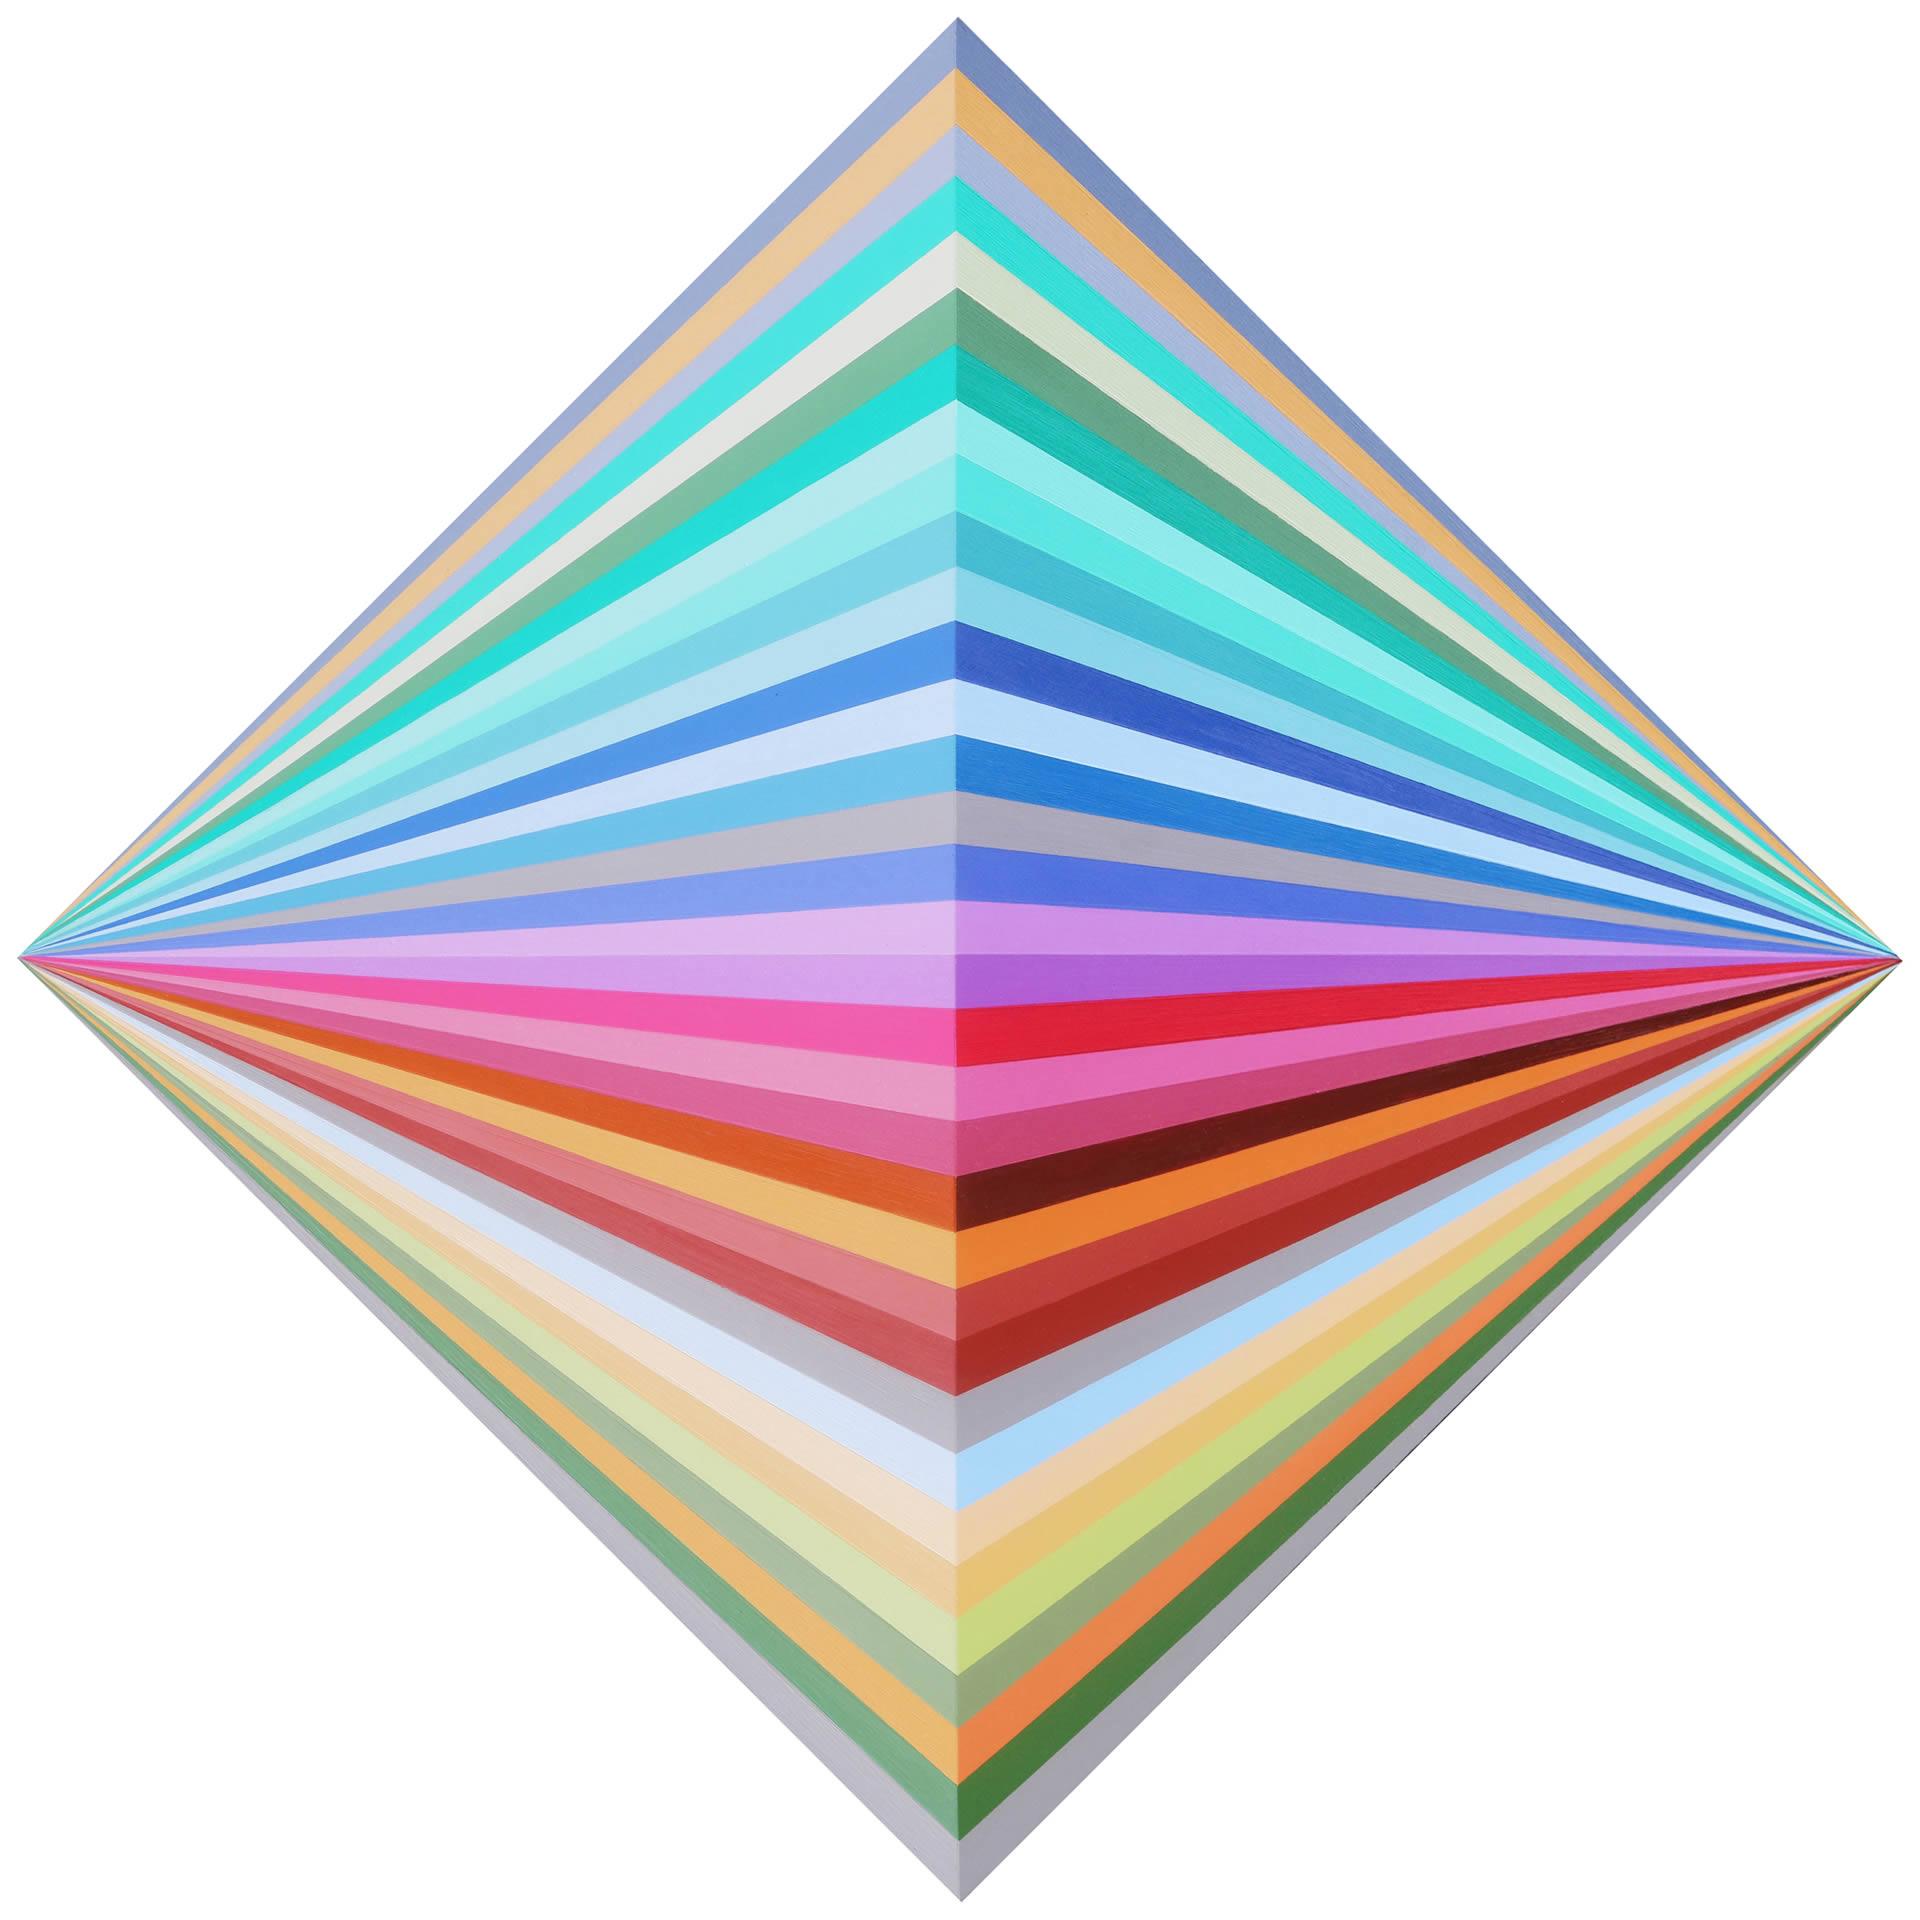 Kristofir-Dean-Refracted-Terrain-24x24-Online-Art-Galleries